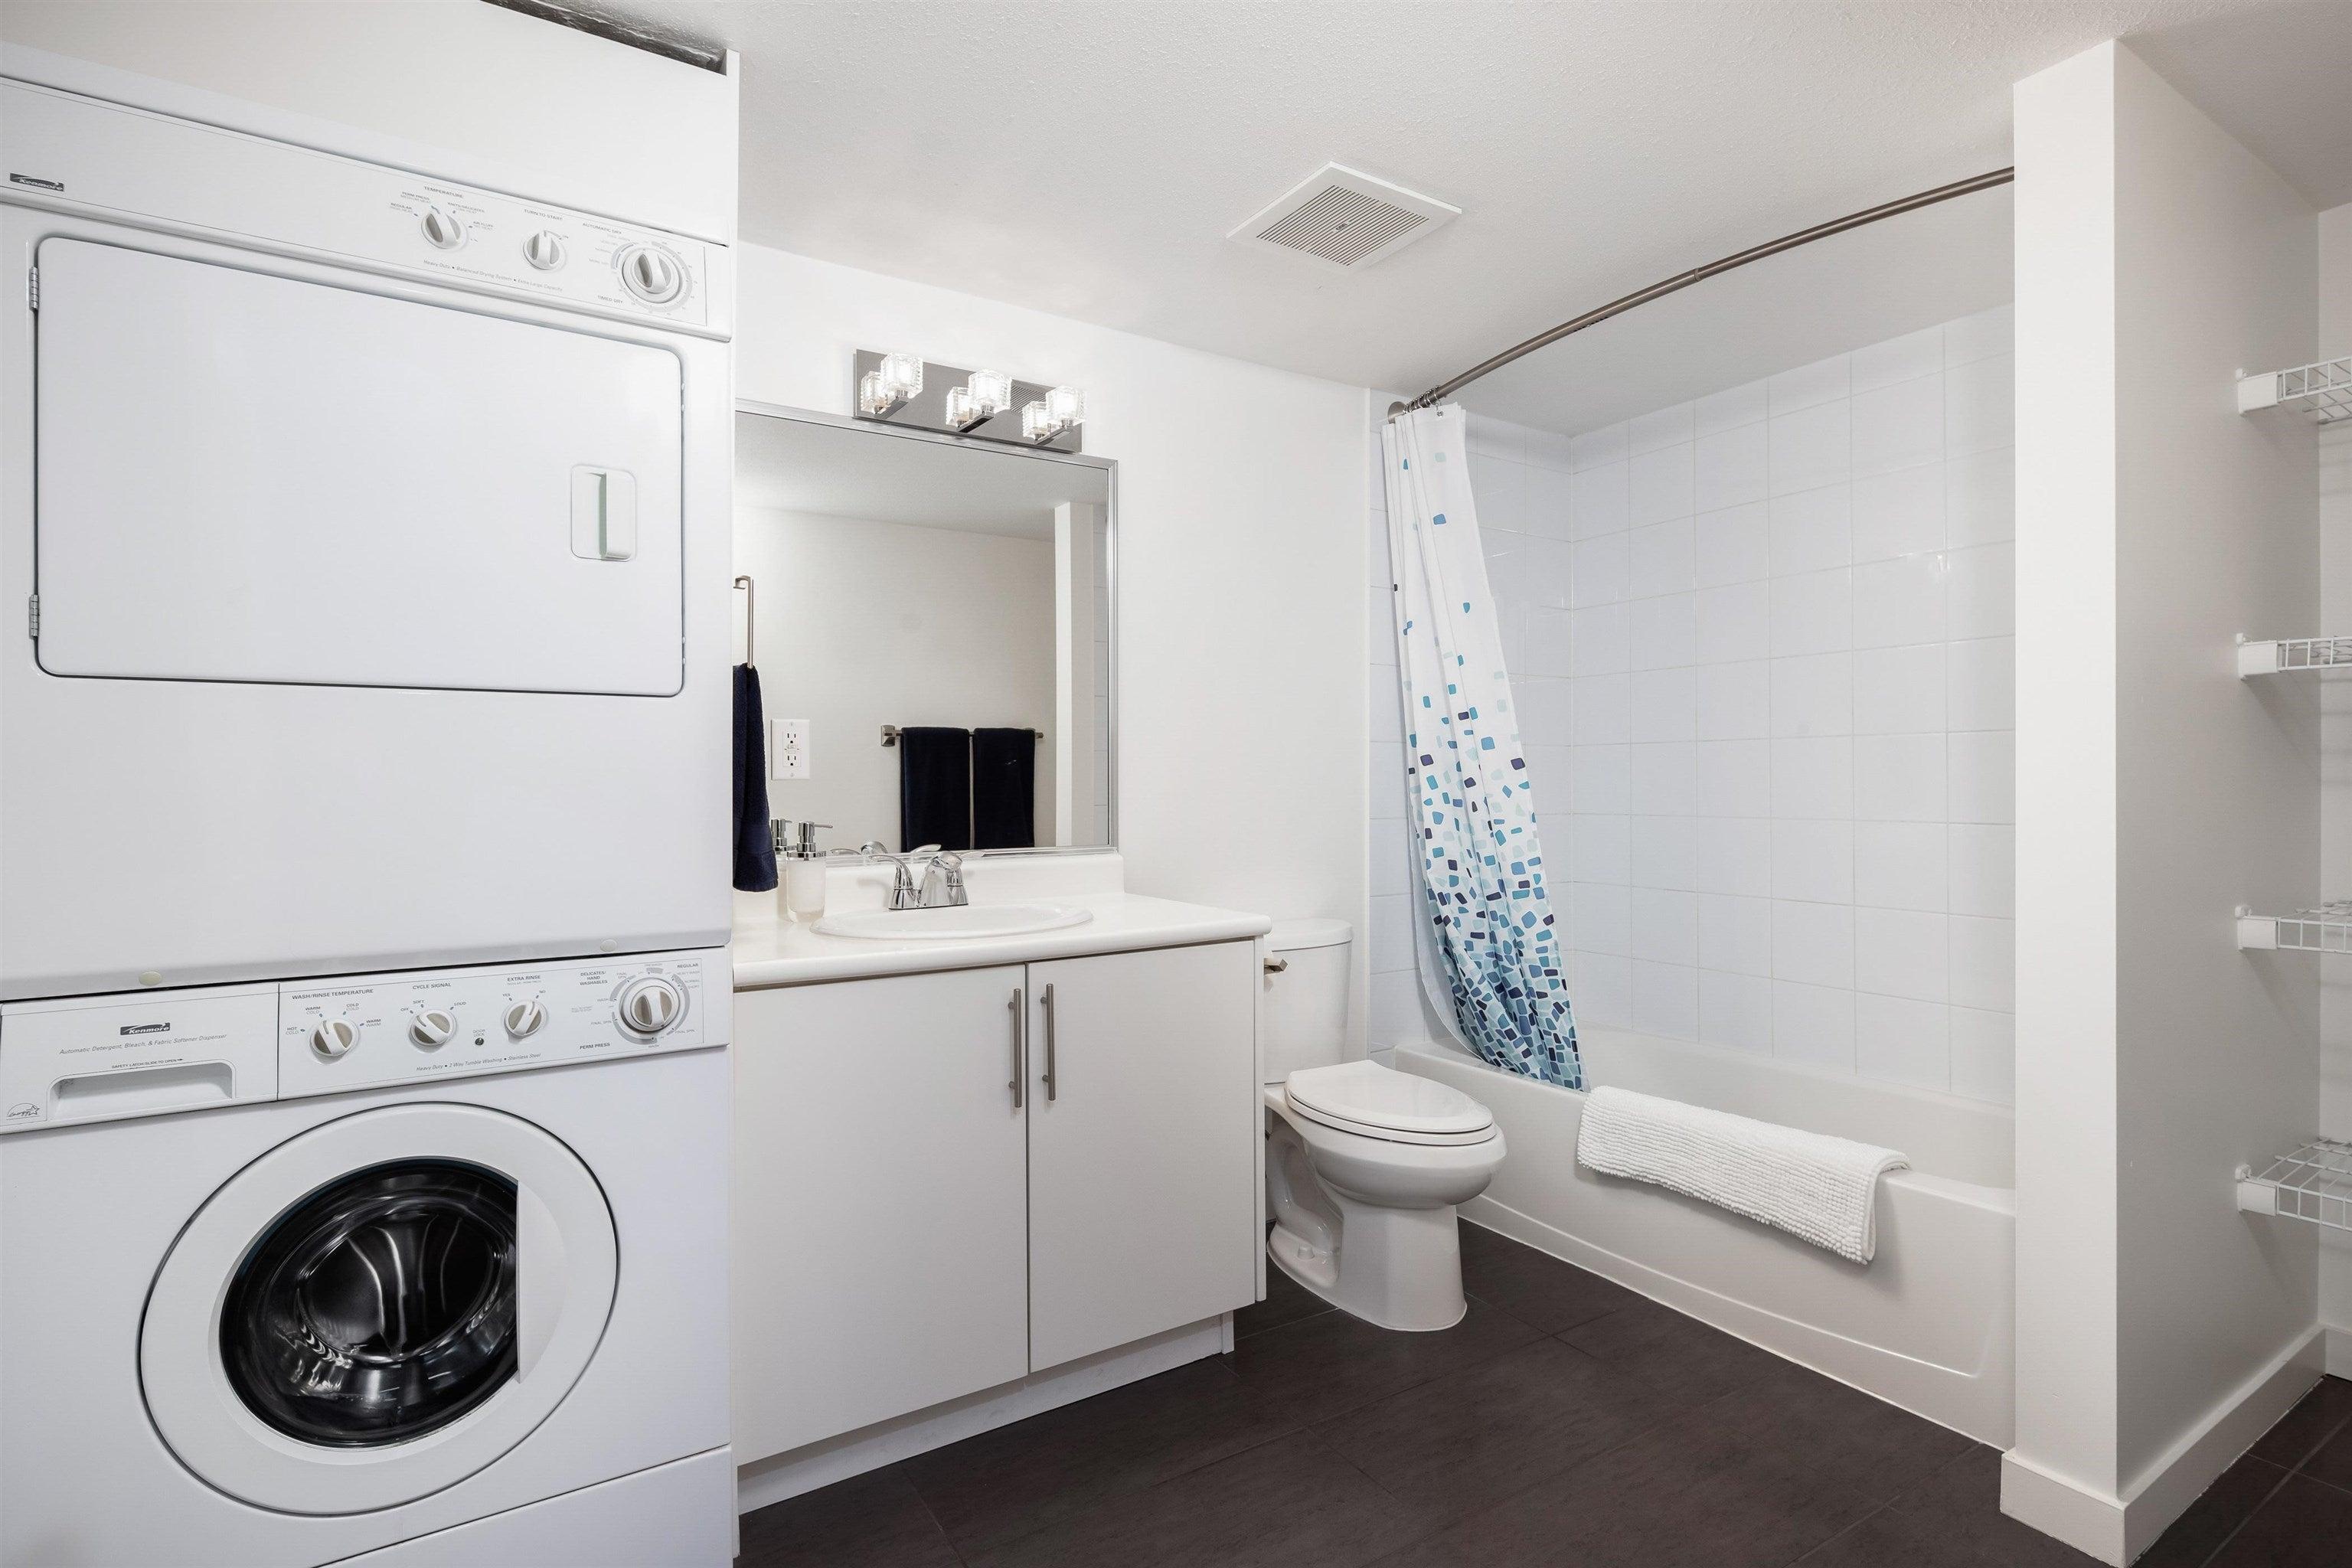 2258 WINDRIDGE DRIVE - Seymour NV House/Single Family for sale, 5 Bedrooms (R2617156) - #36